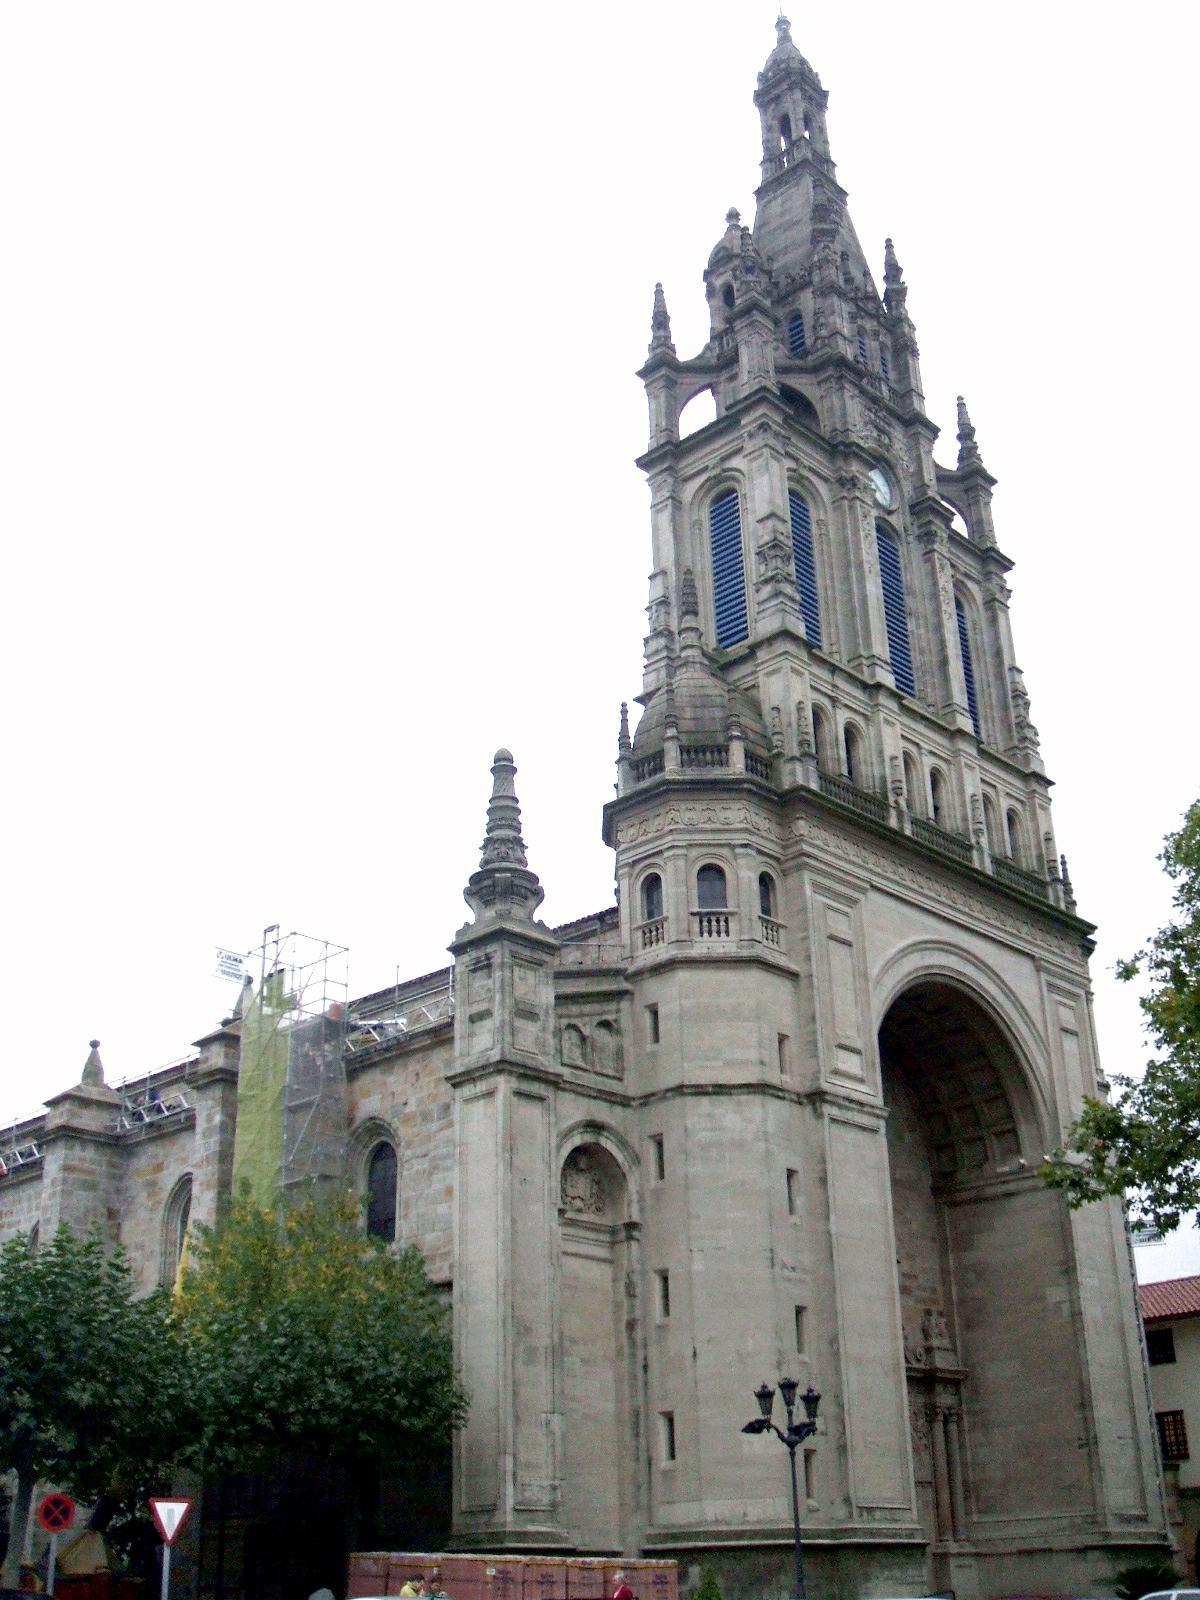 File:Bilbao - Basilica de Begoña 14.JPG - Wikimedia Commons